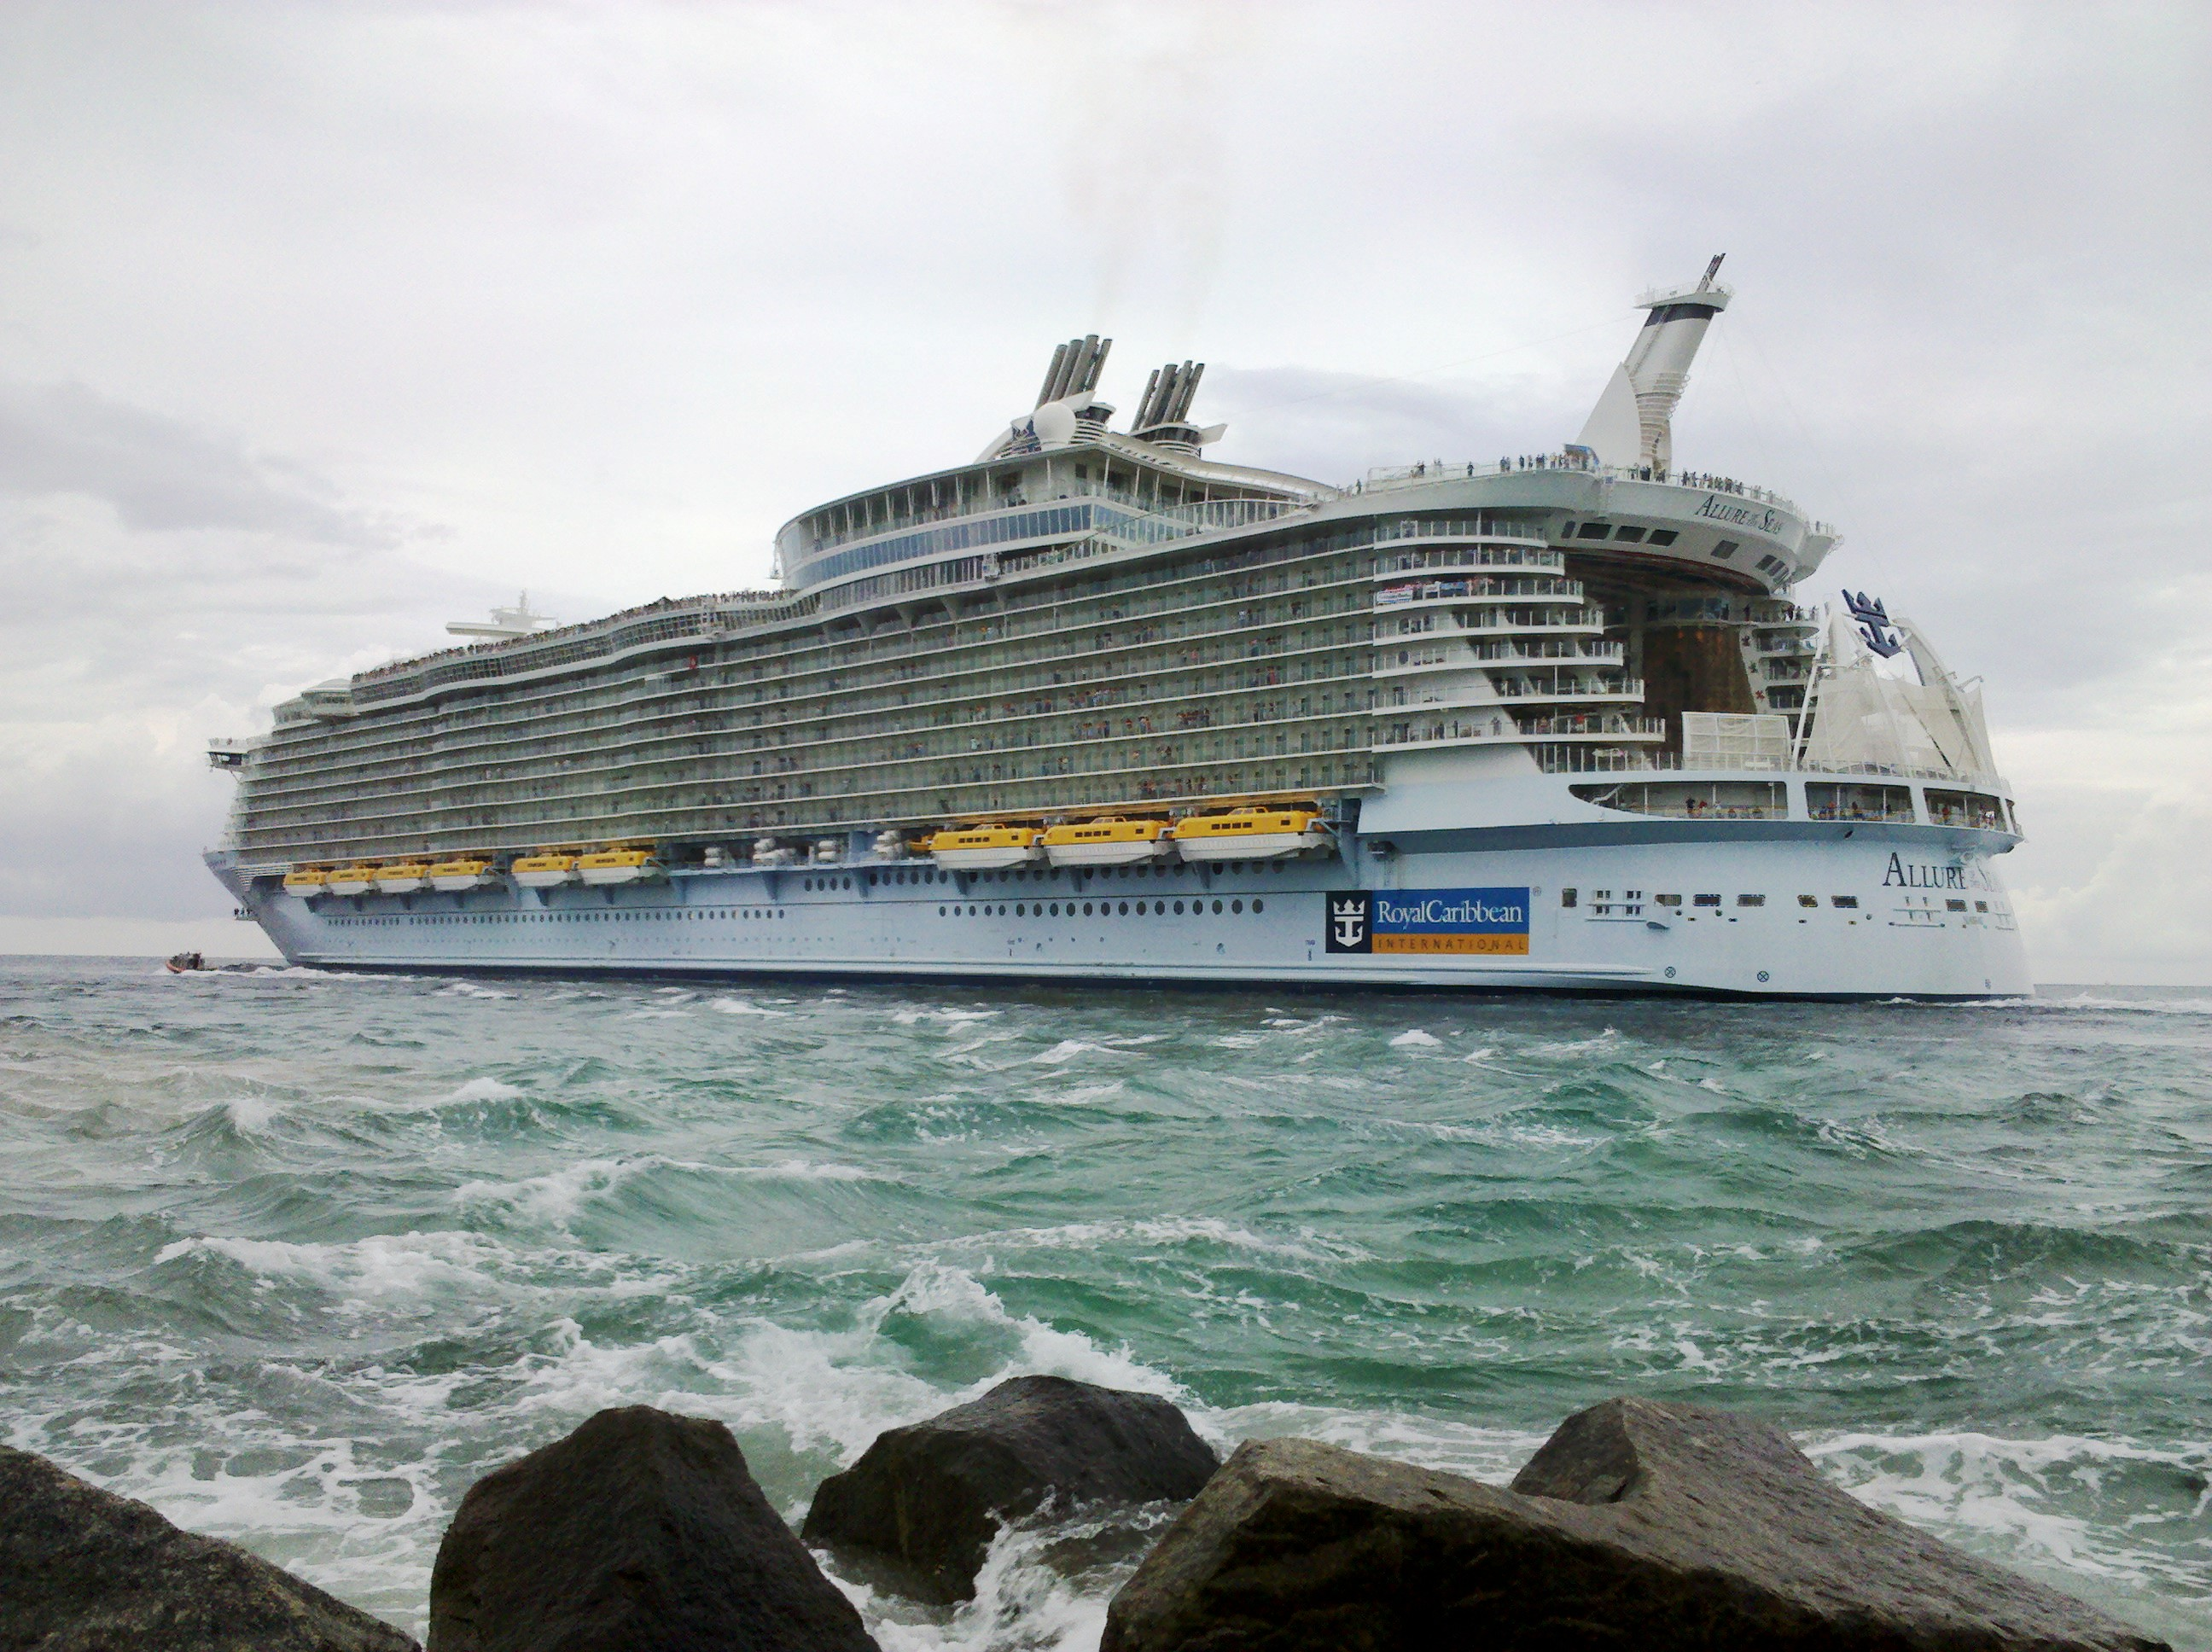 FileAllure Of The Seas Leaving Port Evergladesjpg Wikimedia - Cruise ship in rough waters